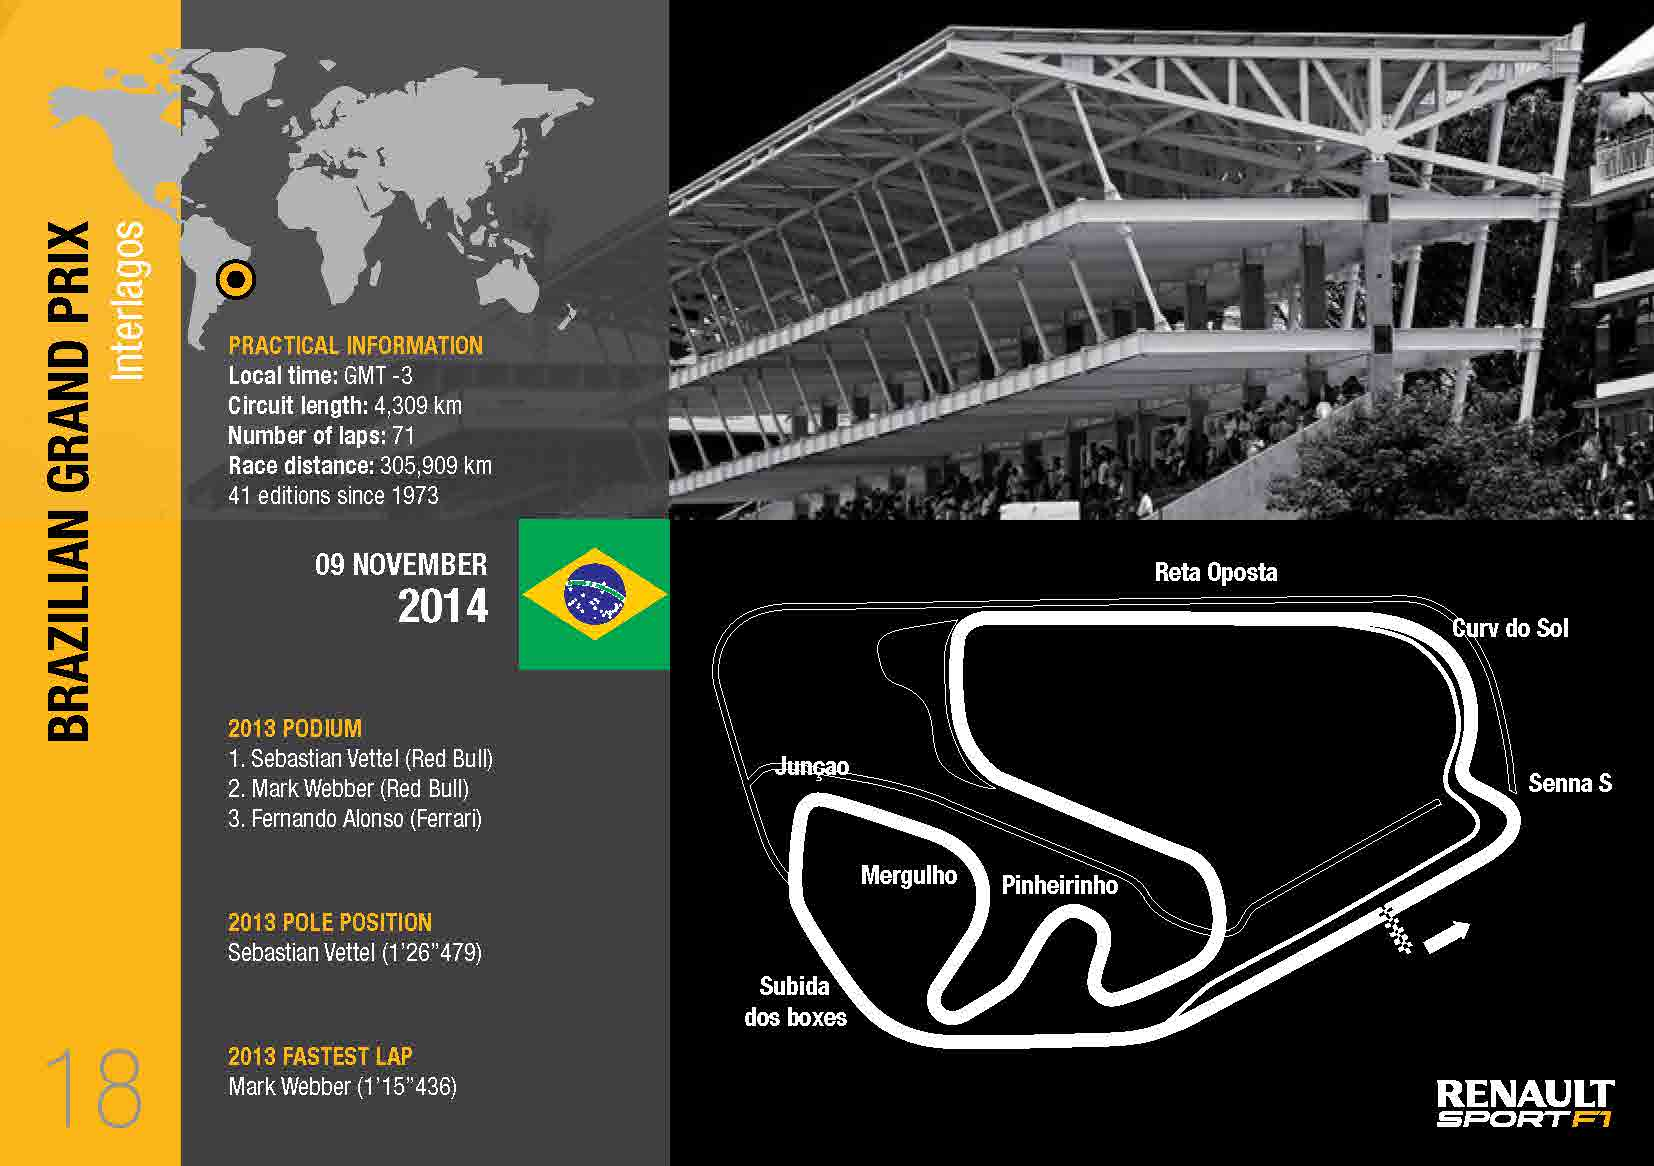 Brasile: anteprima Renault Sport F1